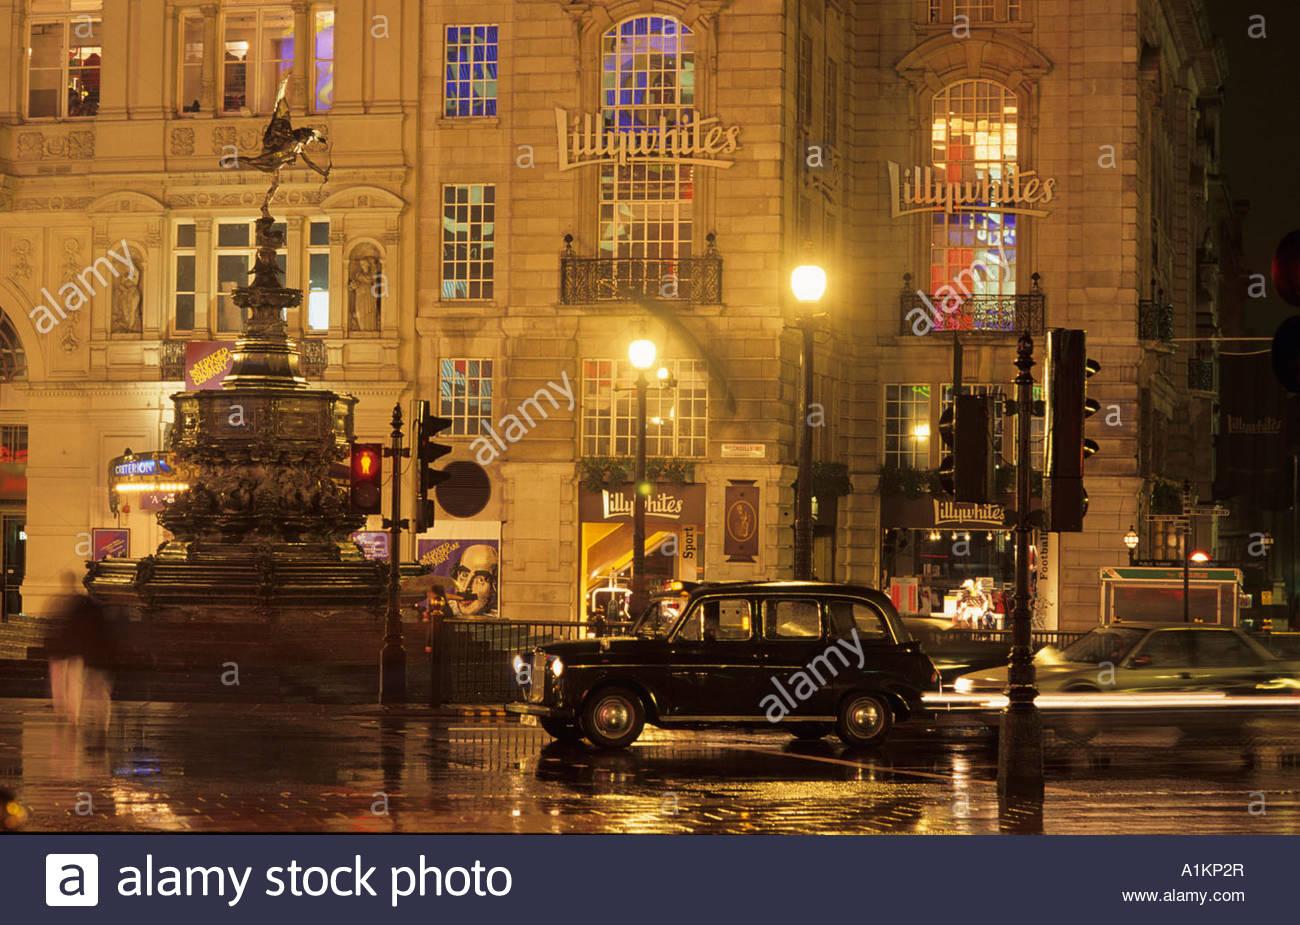 Taxi at Picadilly Circus, London - Stock Image